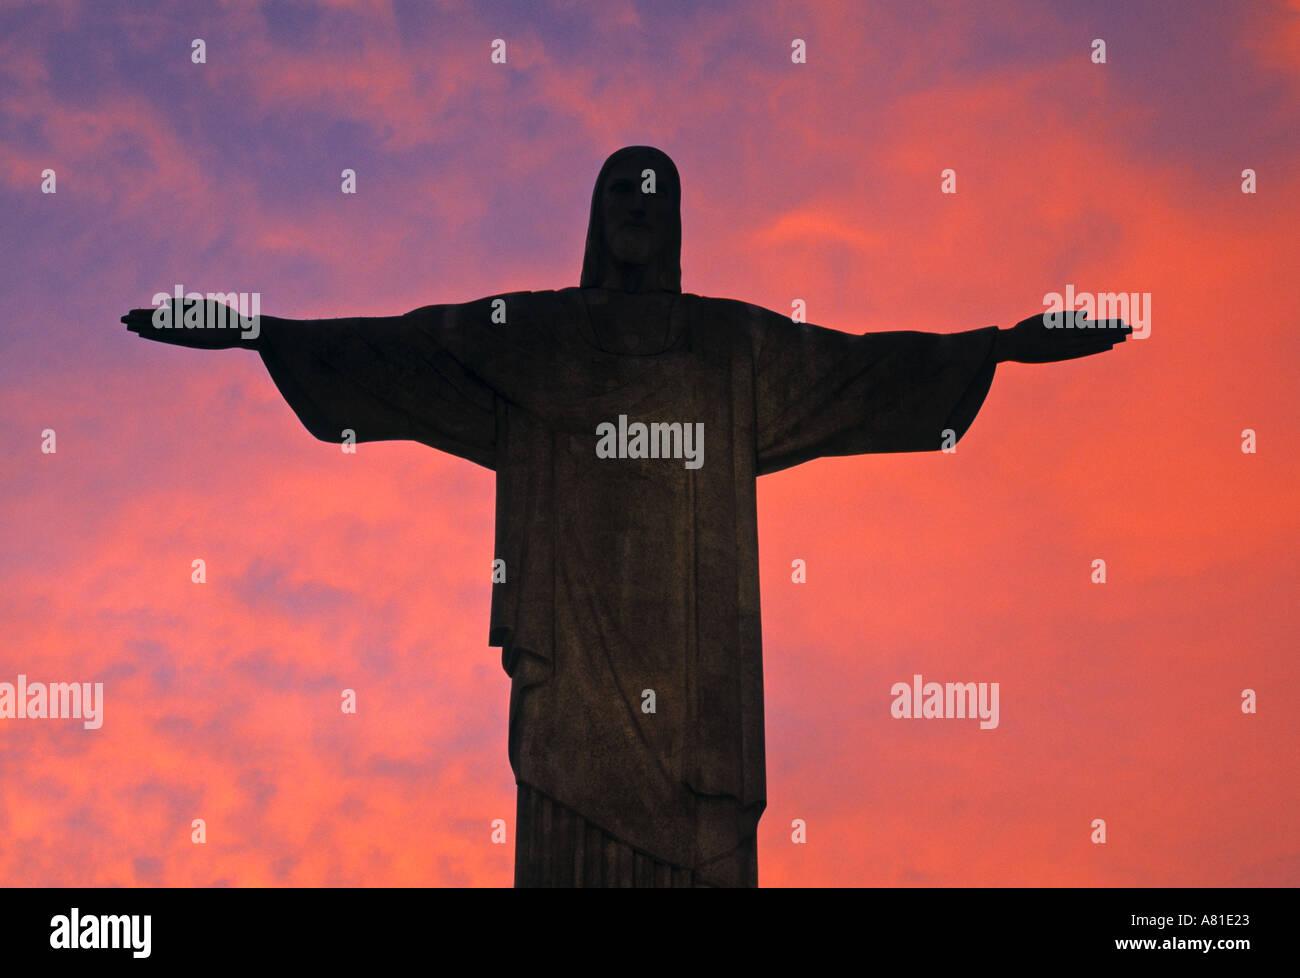 Christus der Erlöser Statue, Rio De Janeiro, Brasilien Stockbild